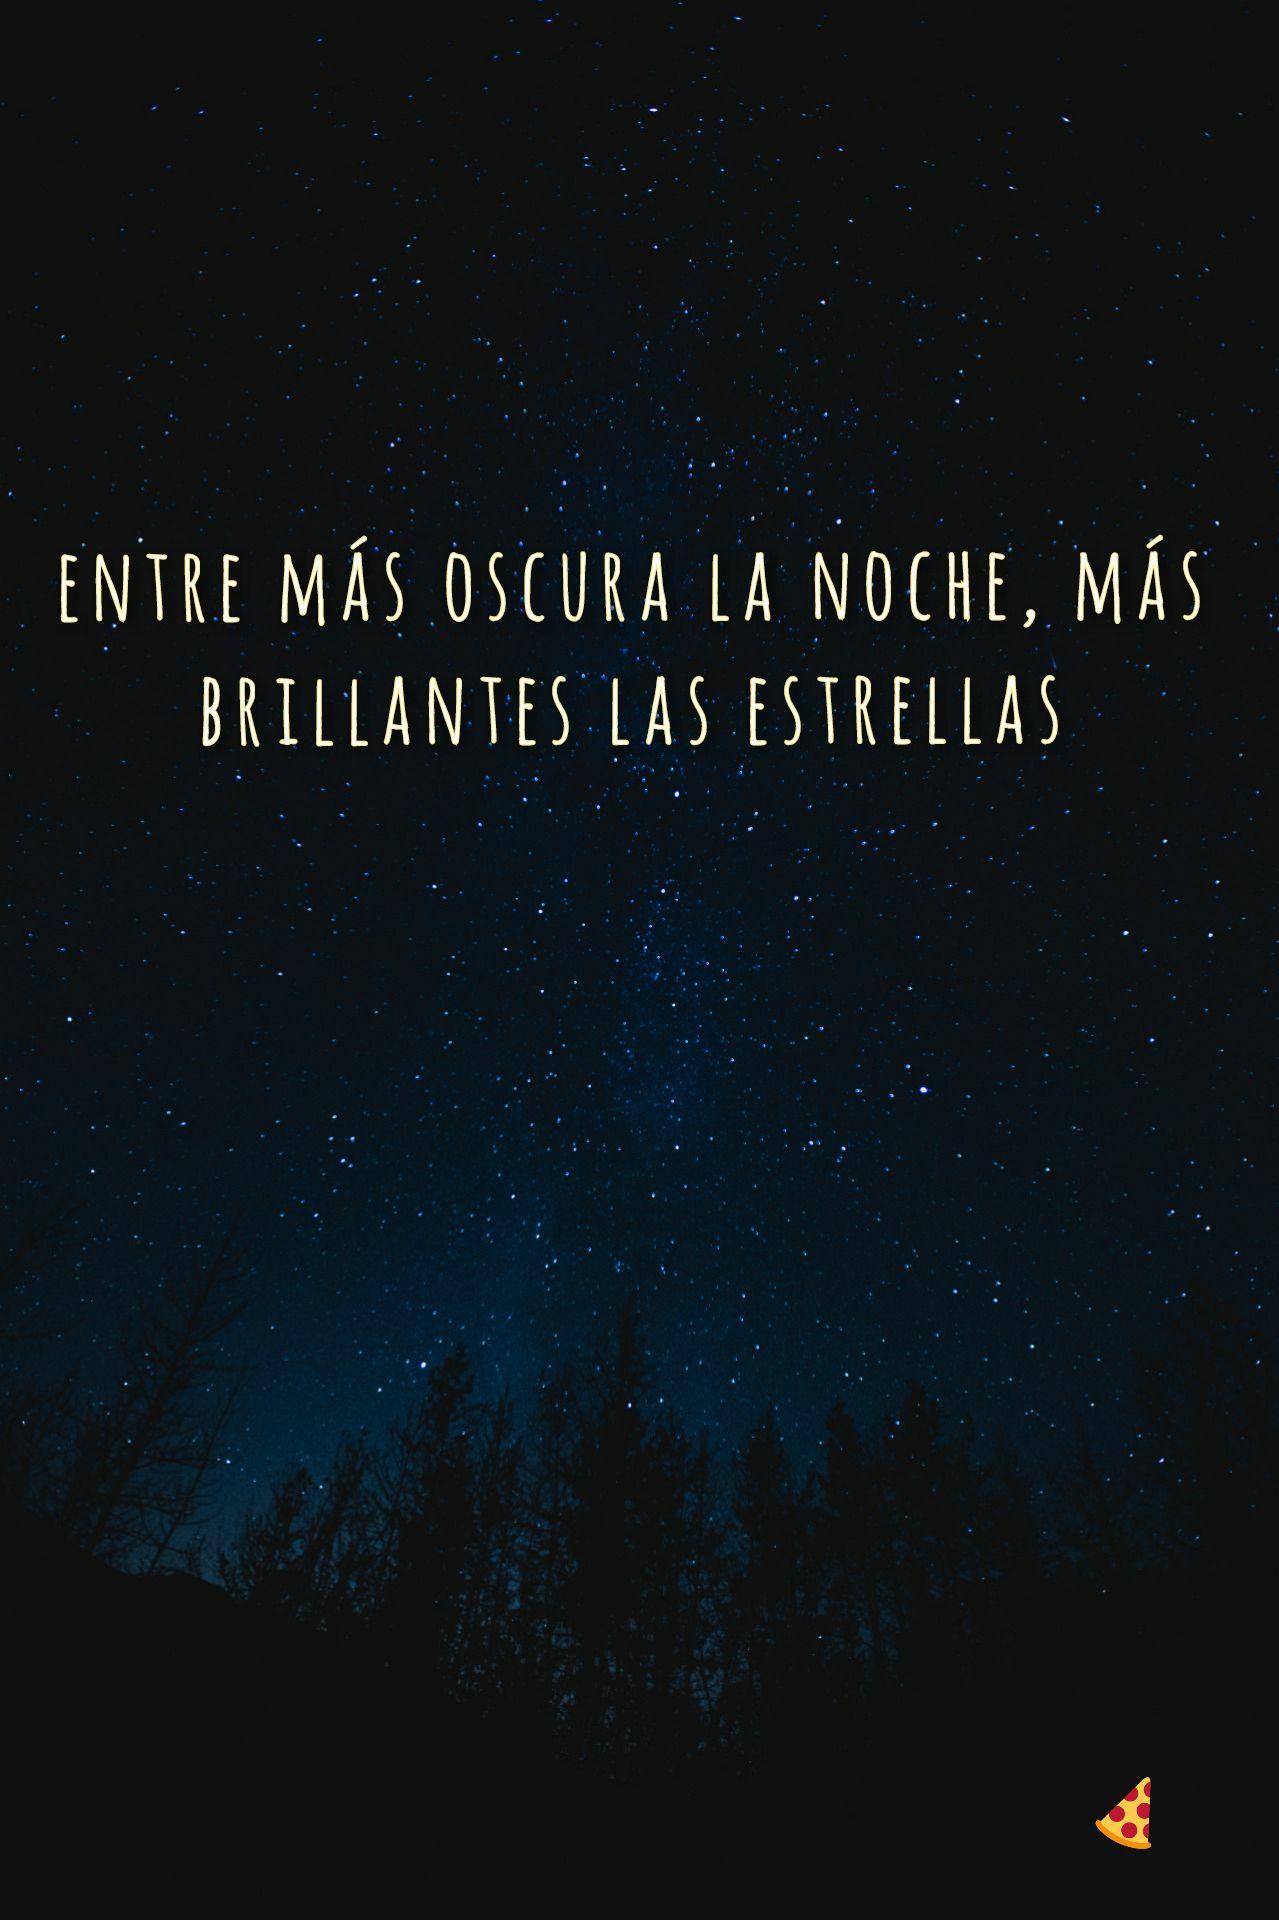 Frases Estrellas Luz Universo Frases Bonitas Universo Estrellas Estrellas